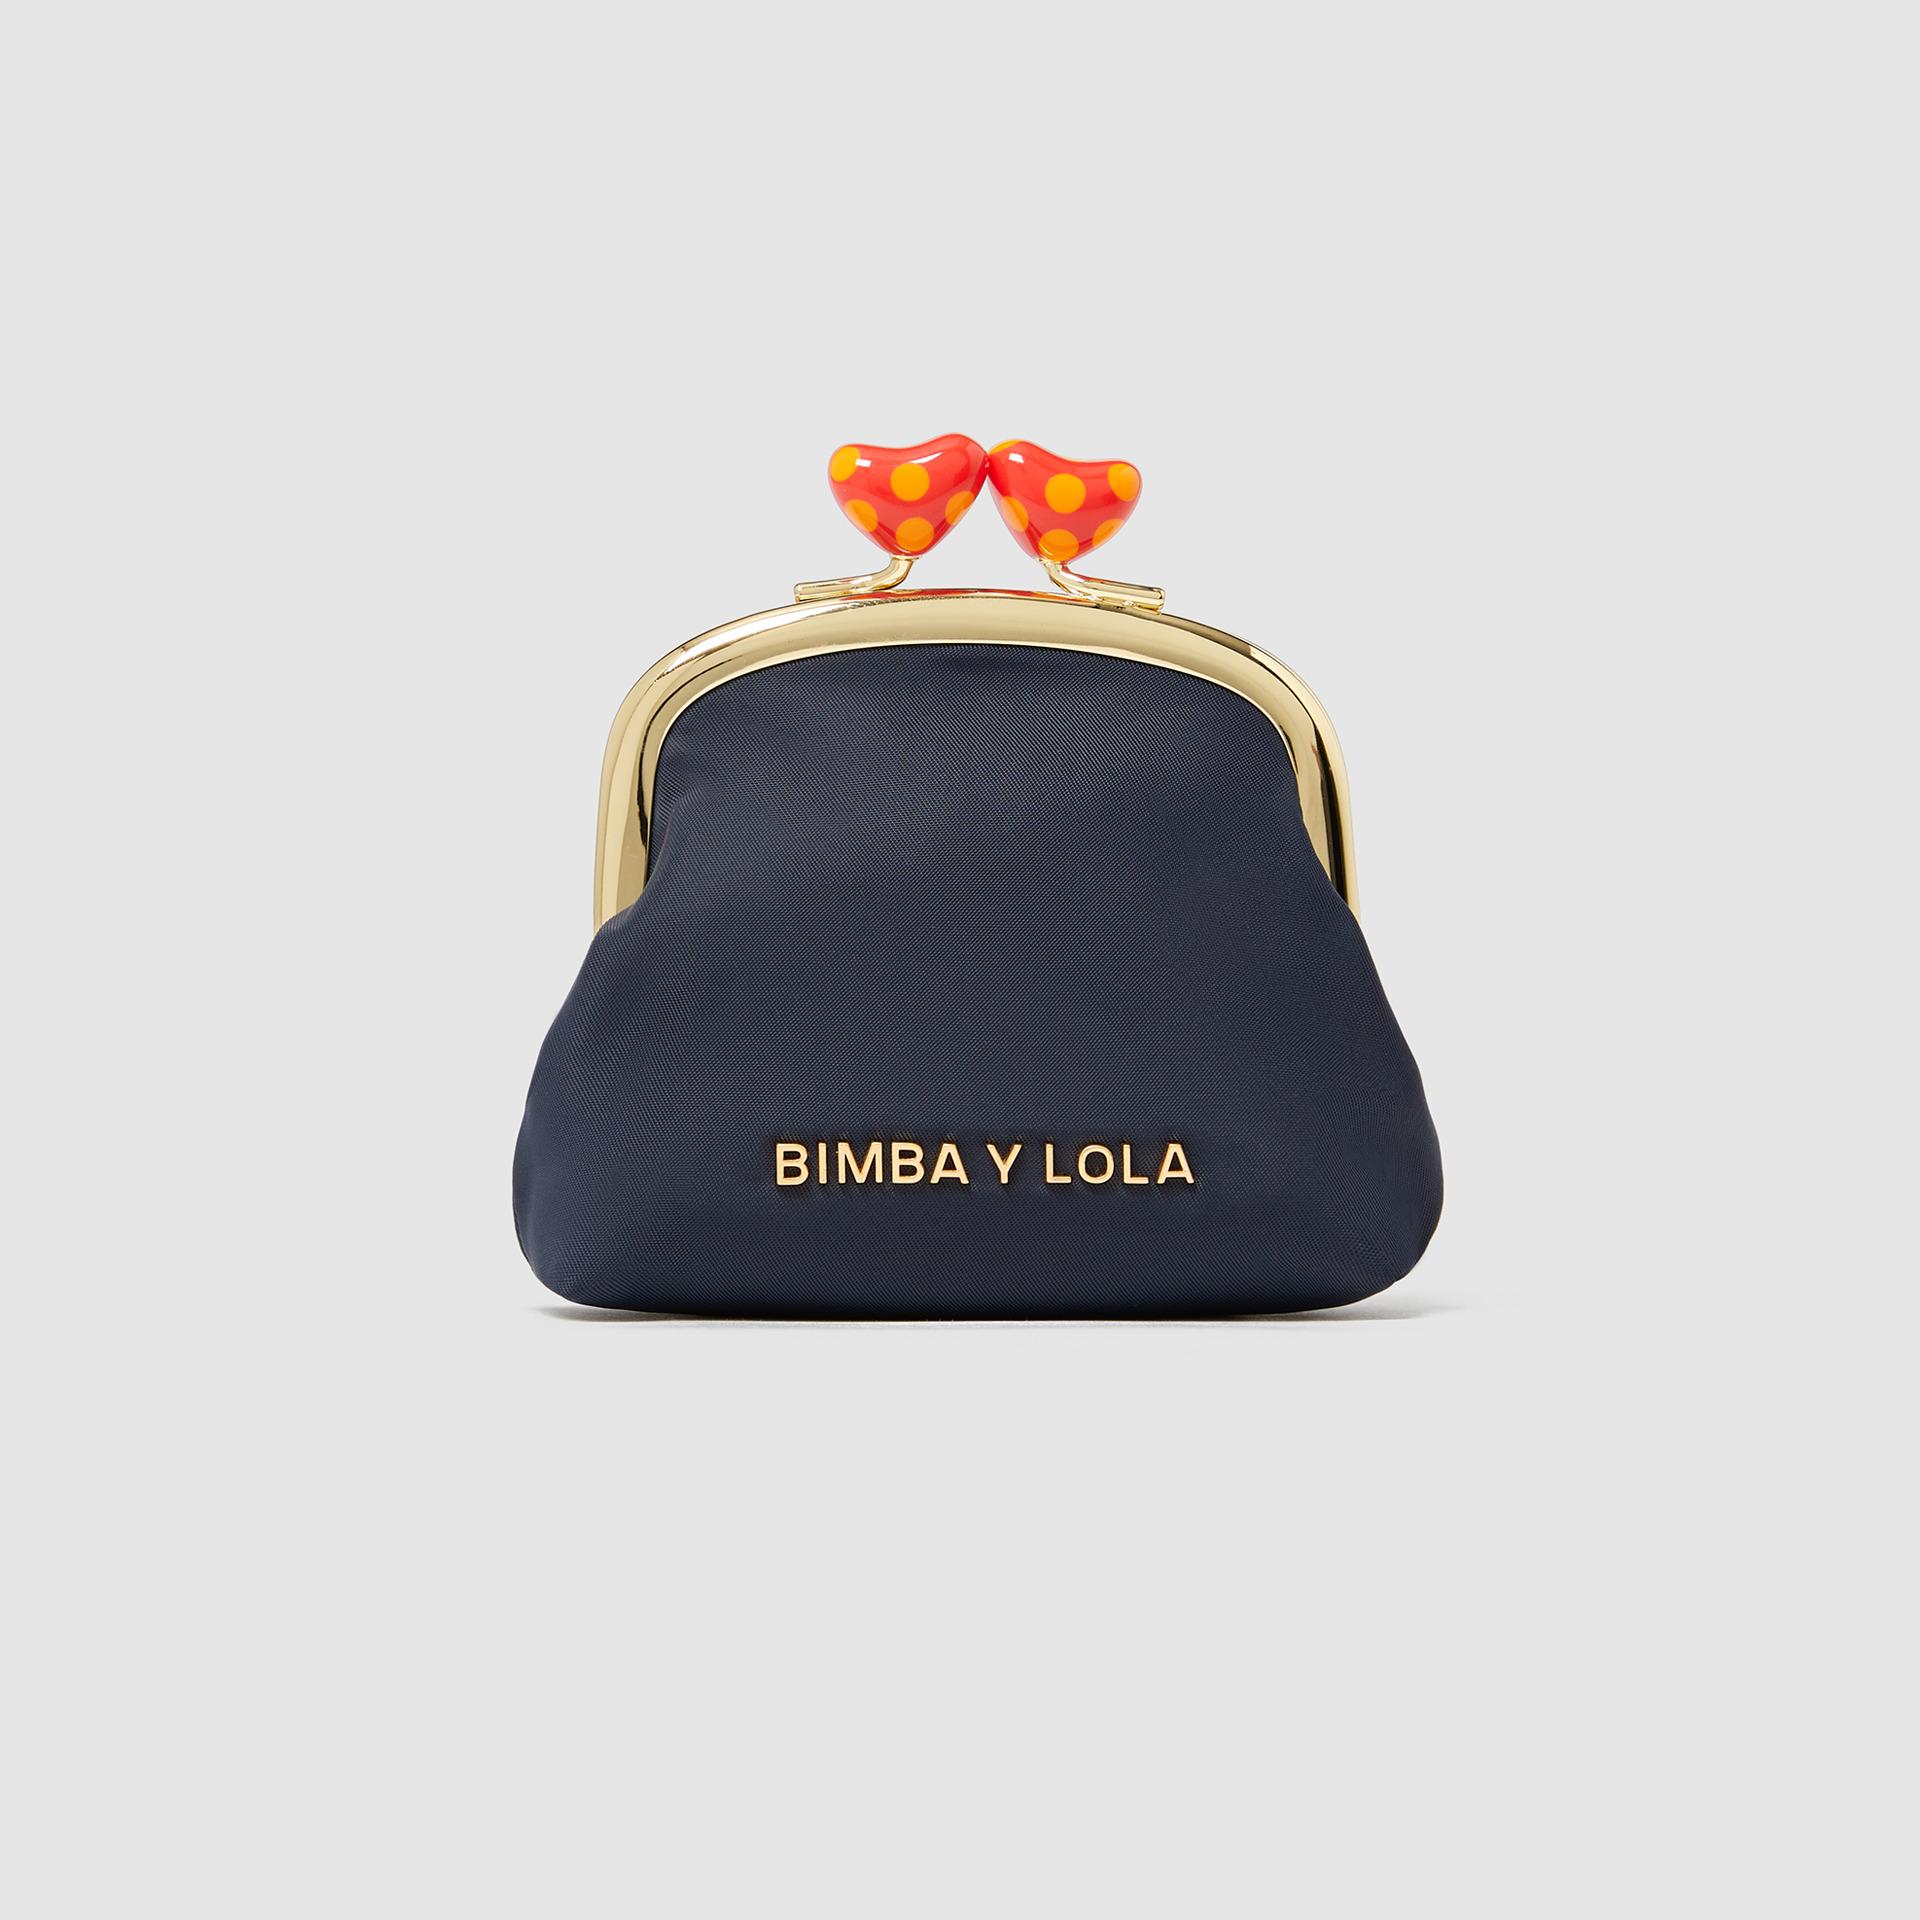 Bimba Y Lola €26,00